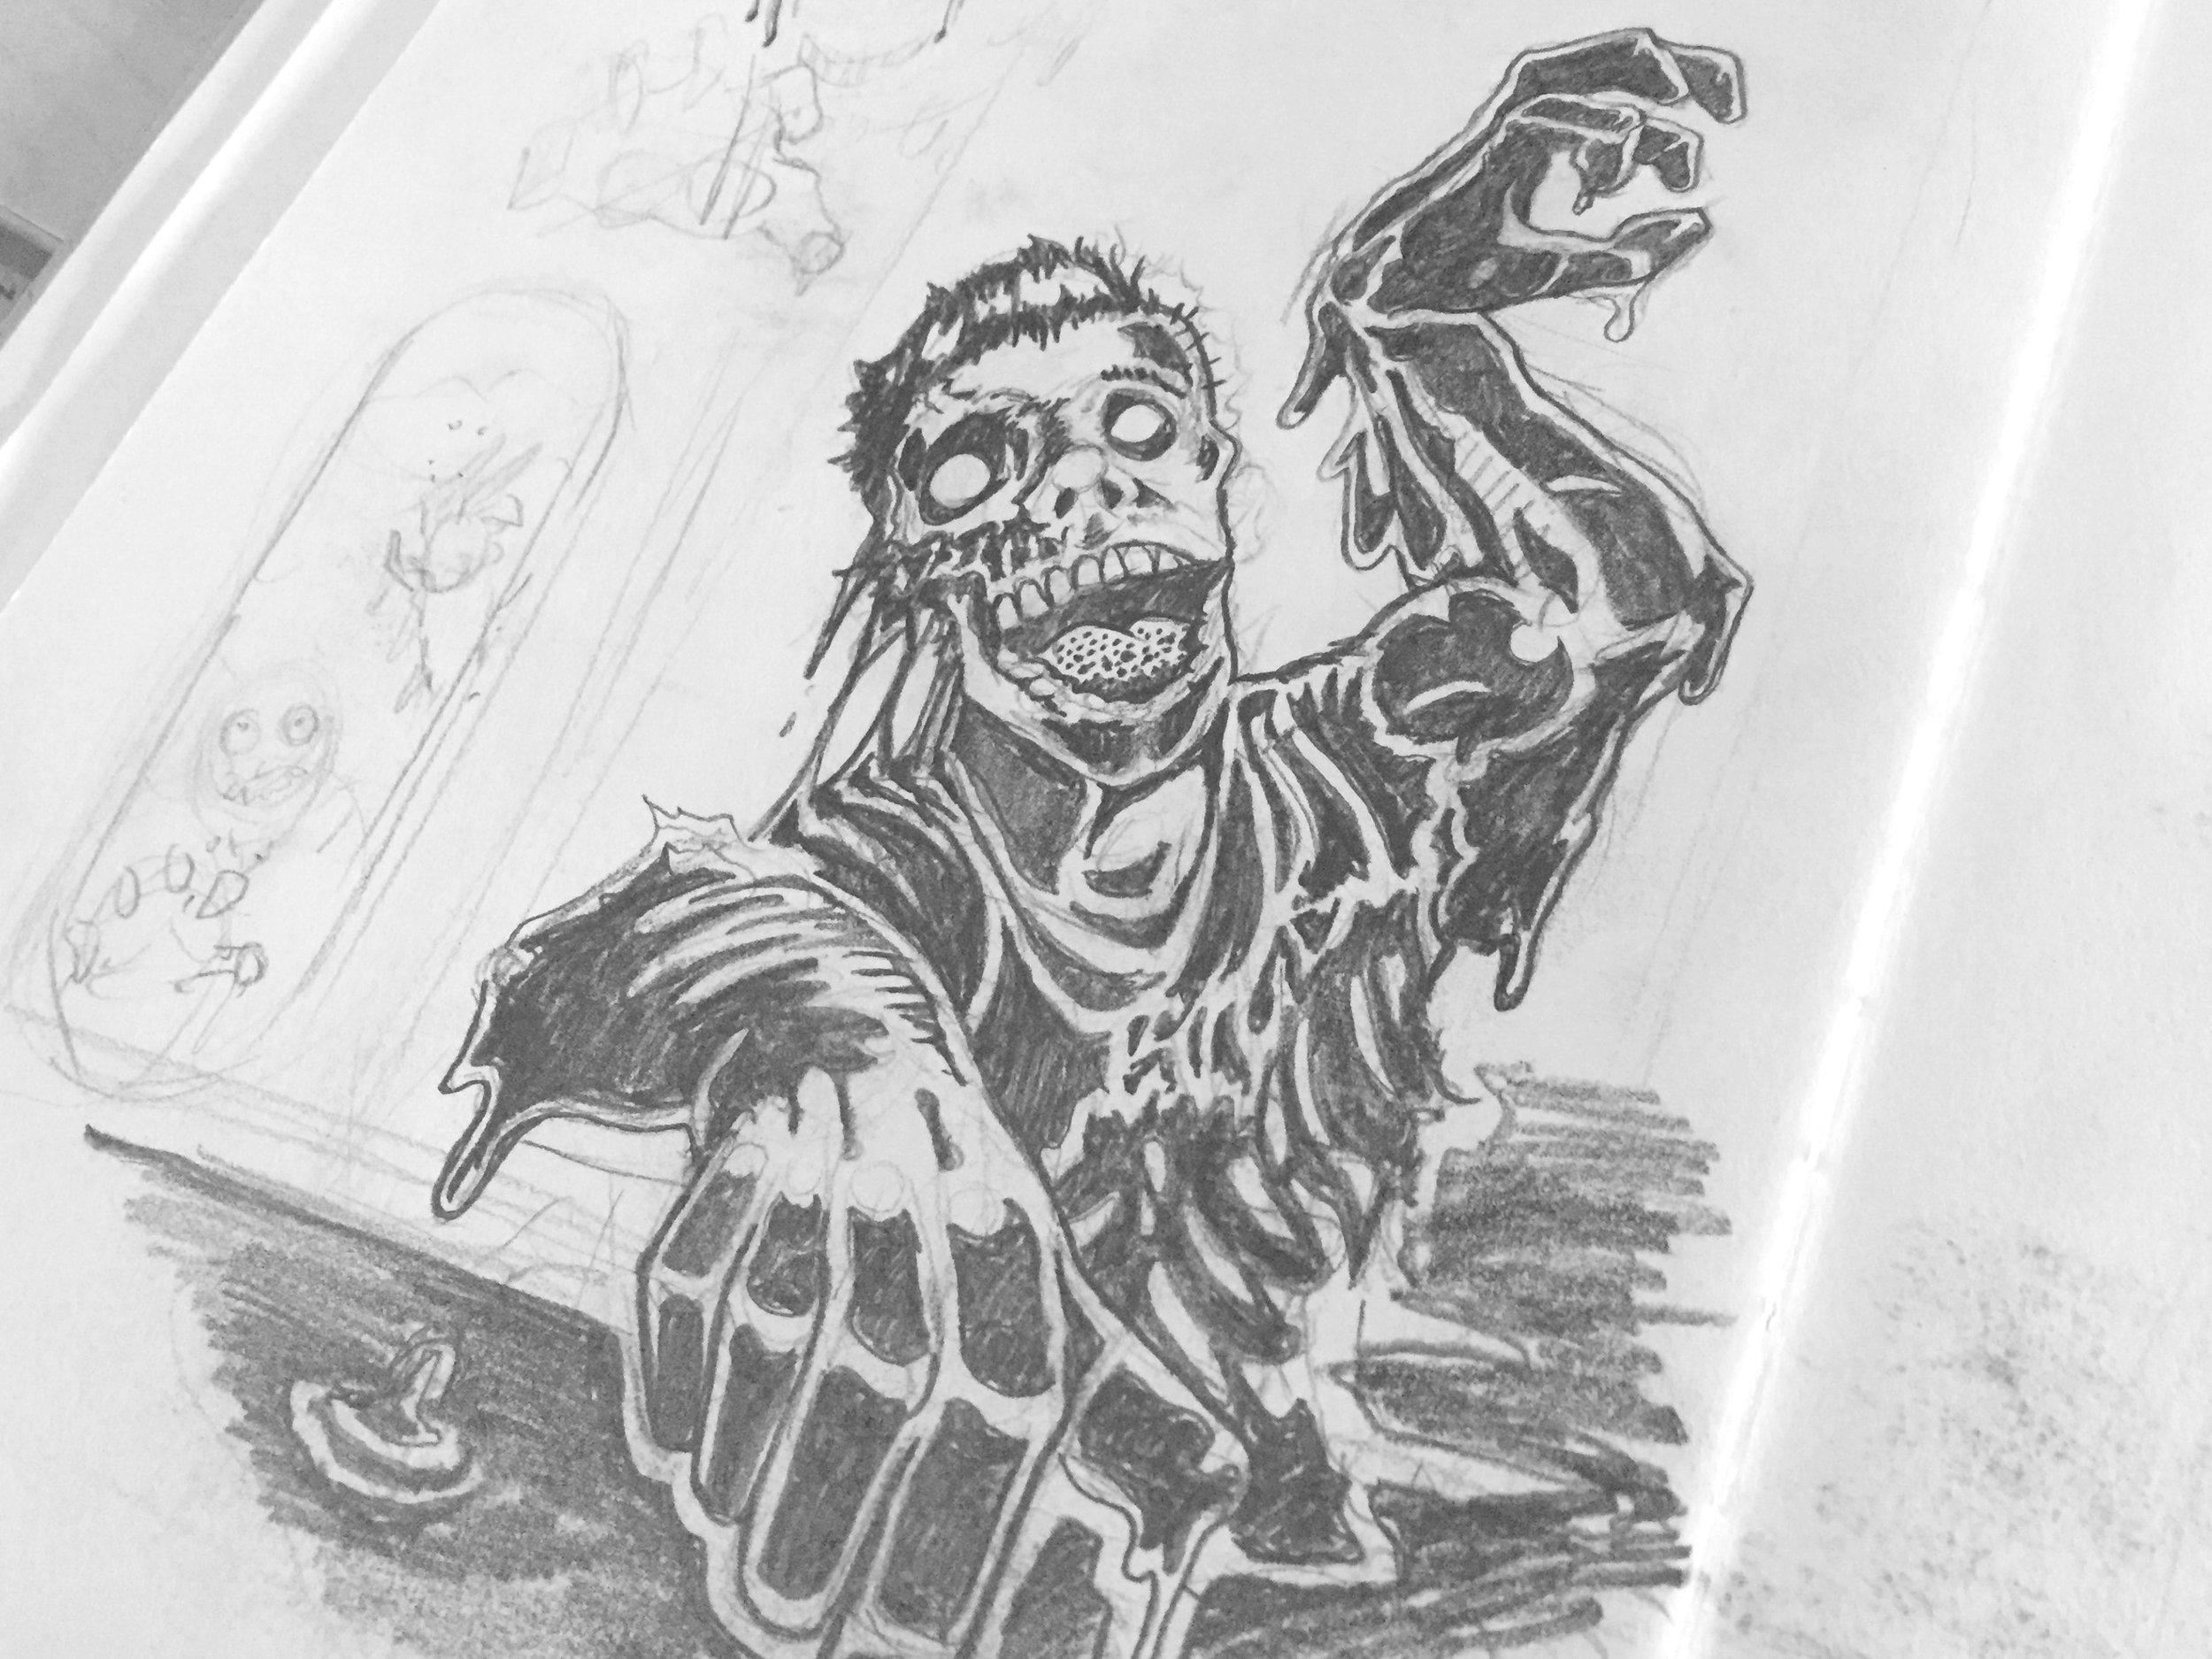 Kidpixel_Zombie.jpg